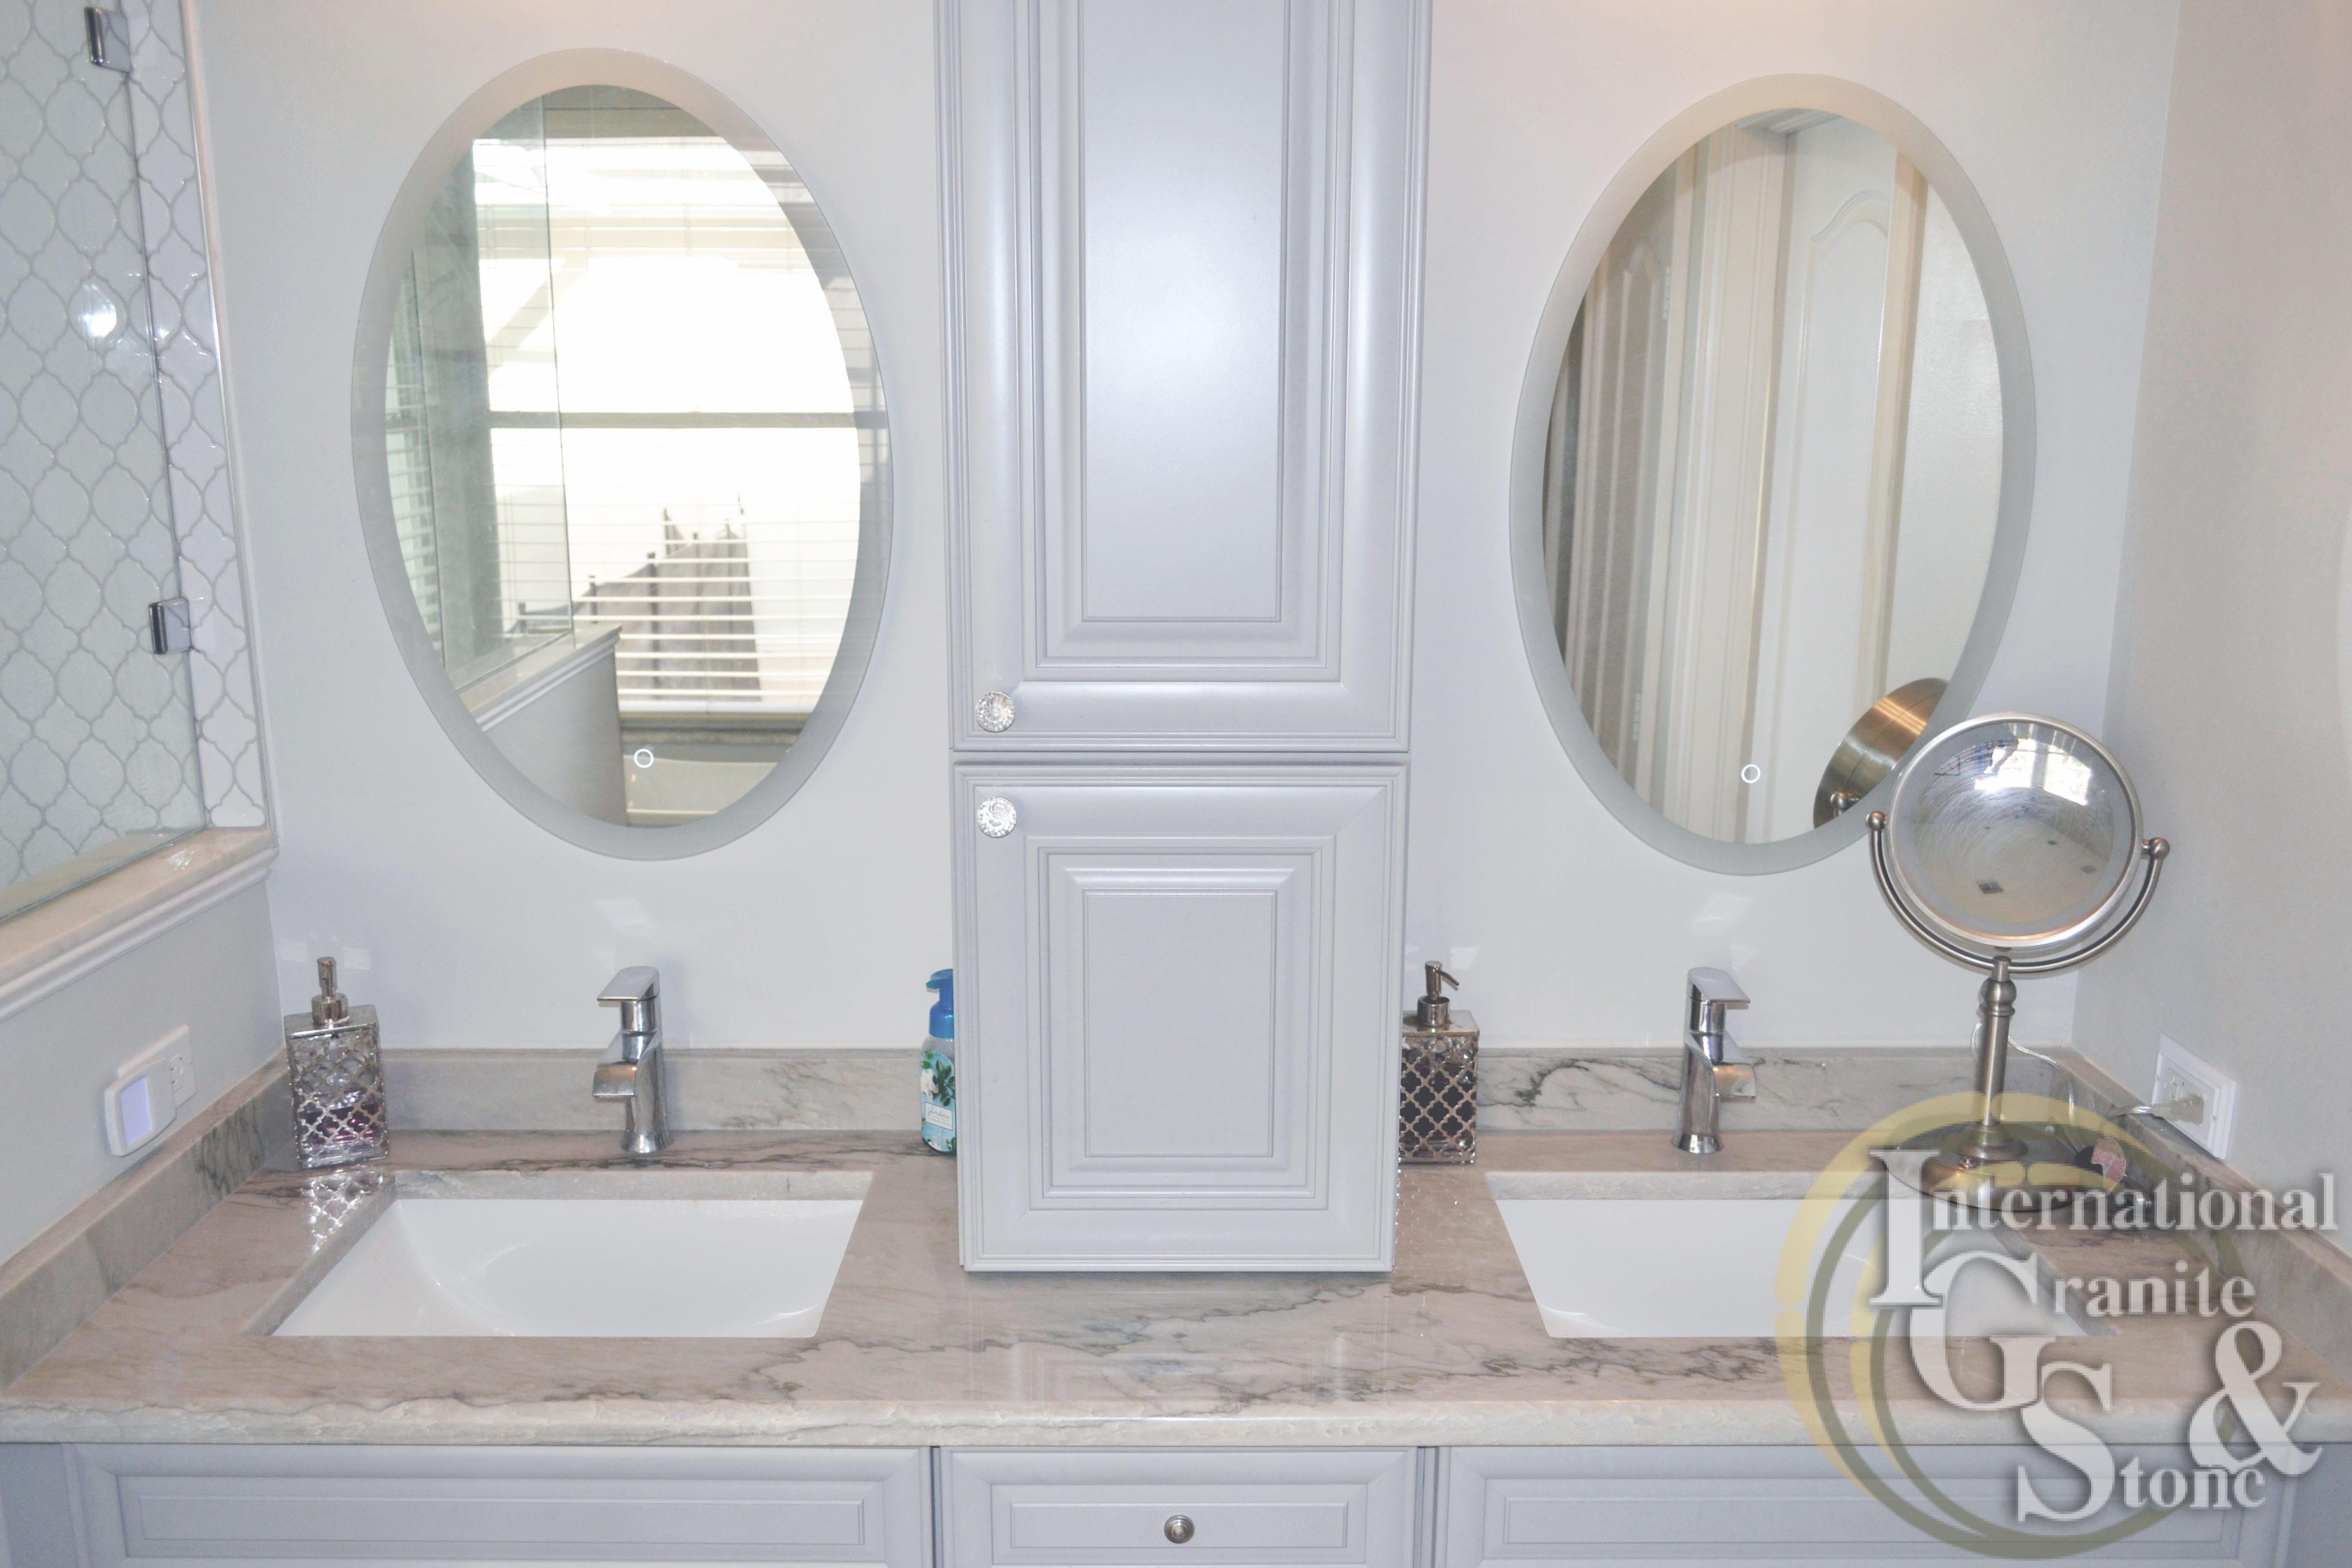 A recent calcatta quartzite master bathroom installation